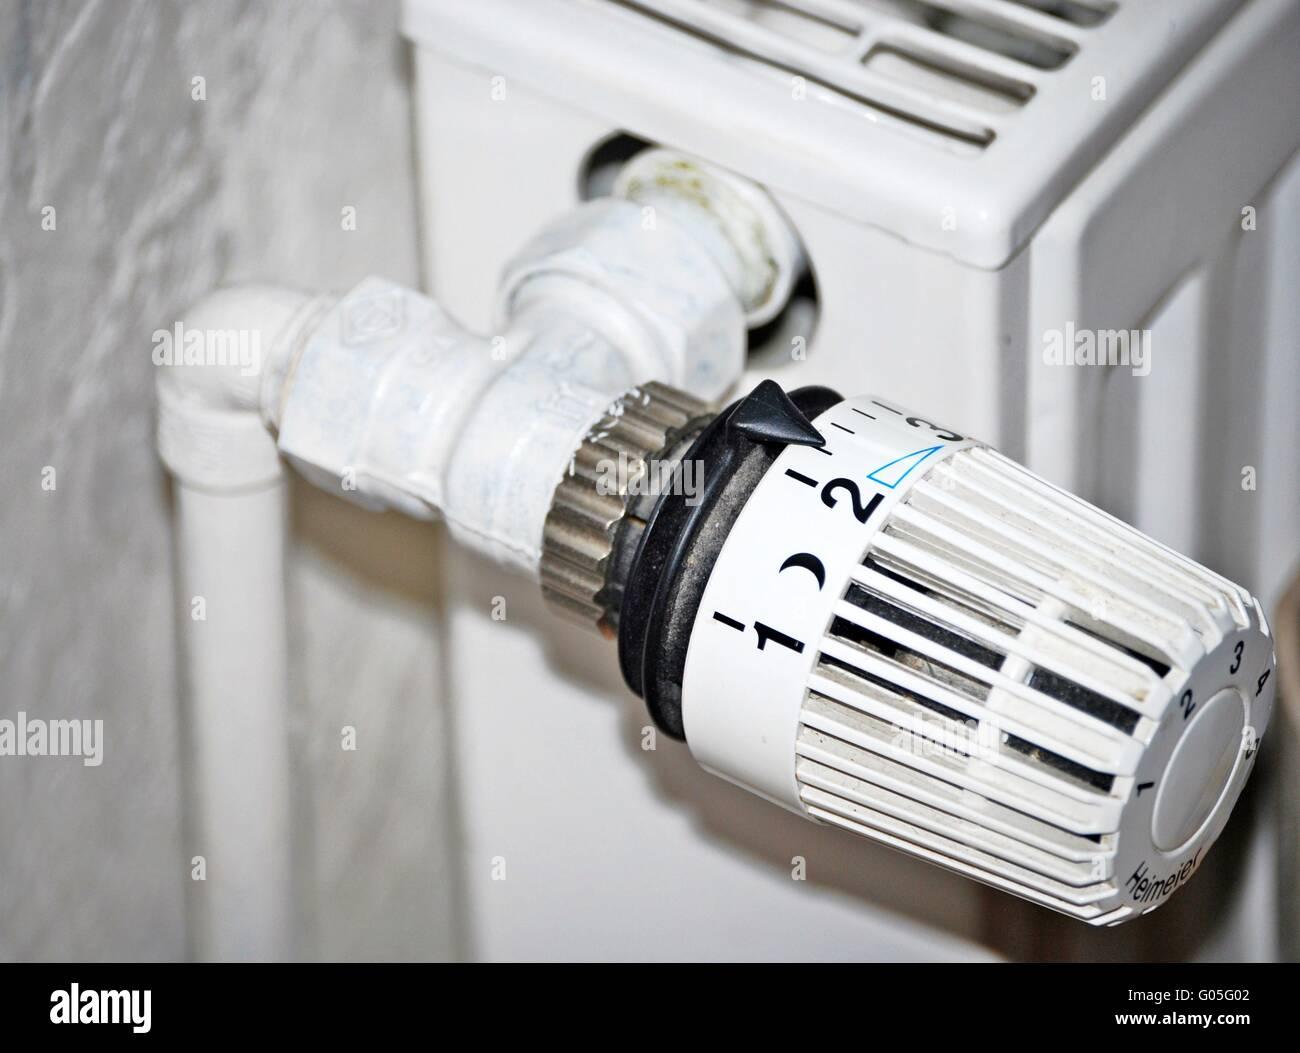 Heizung Thermostat Stockfoto Bild 103384514 Alamy